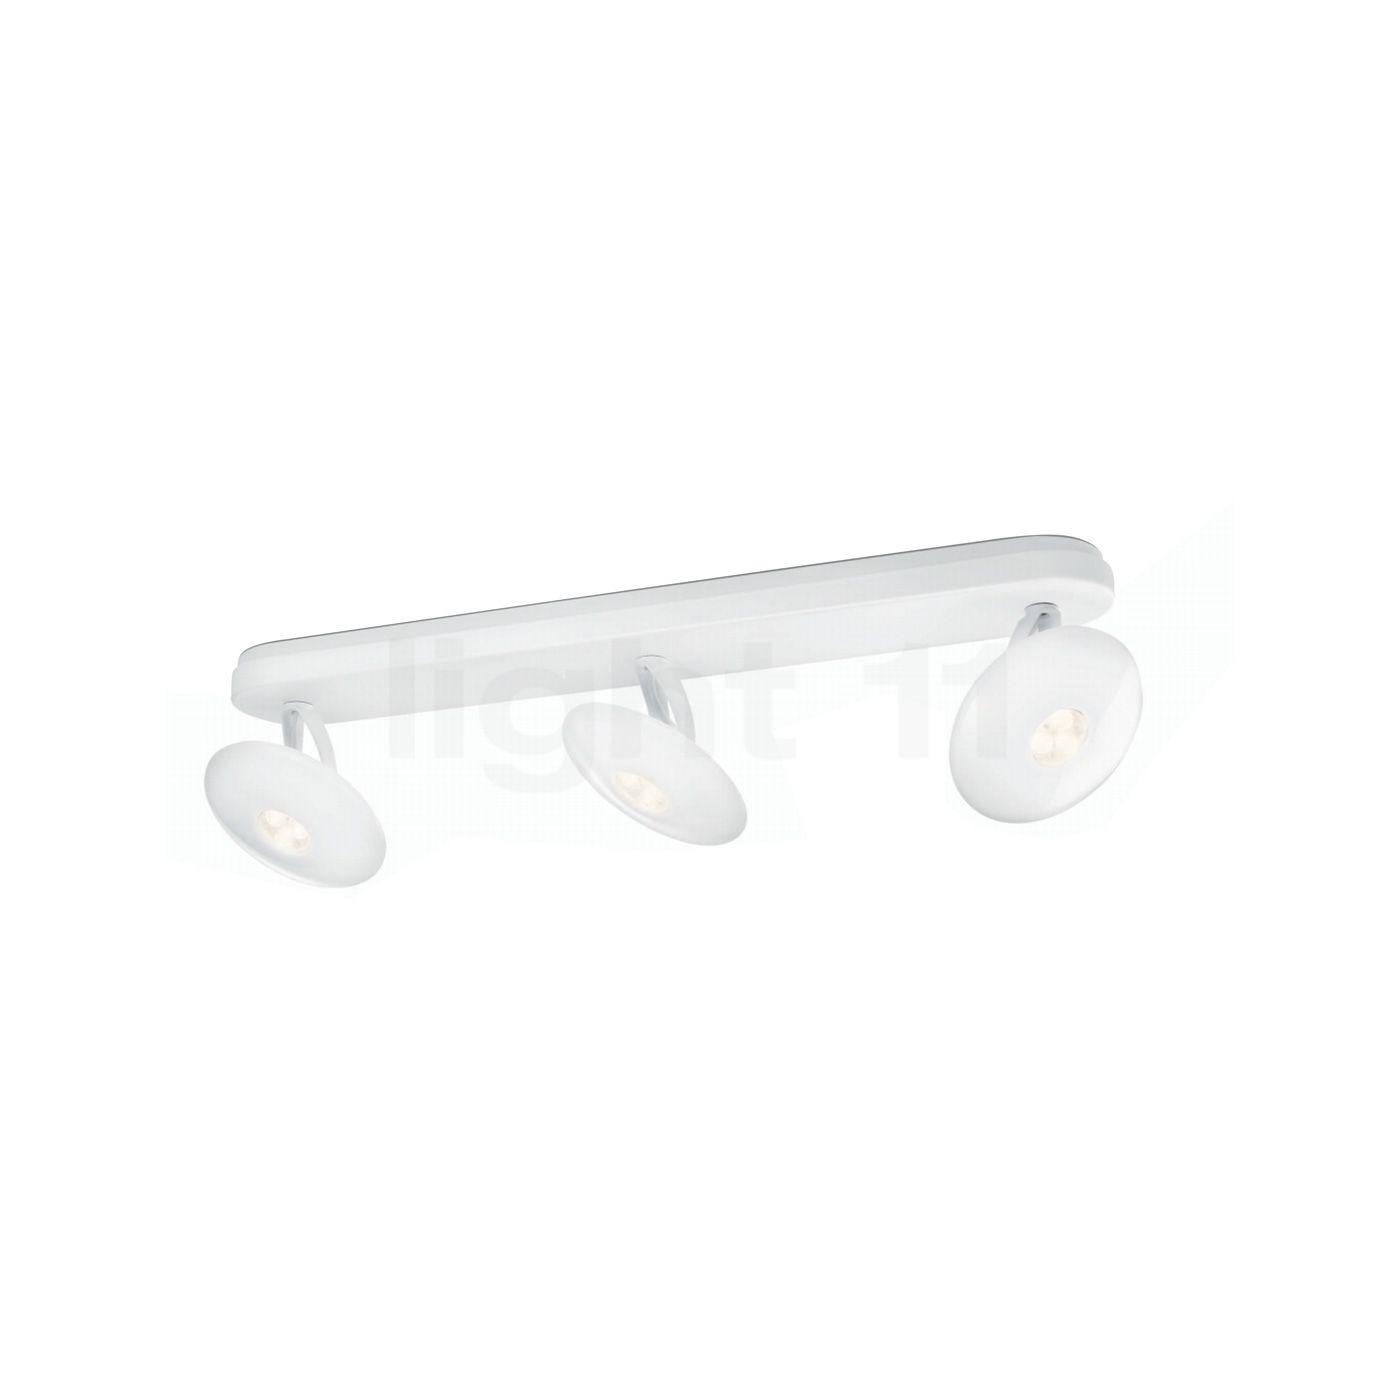 philips ledino tympan spot led 53143 strahler und spot. Black Bedroom Furniture Sets. Home Design Ideas